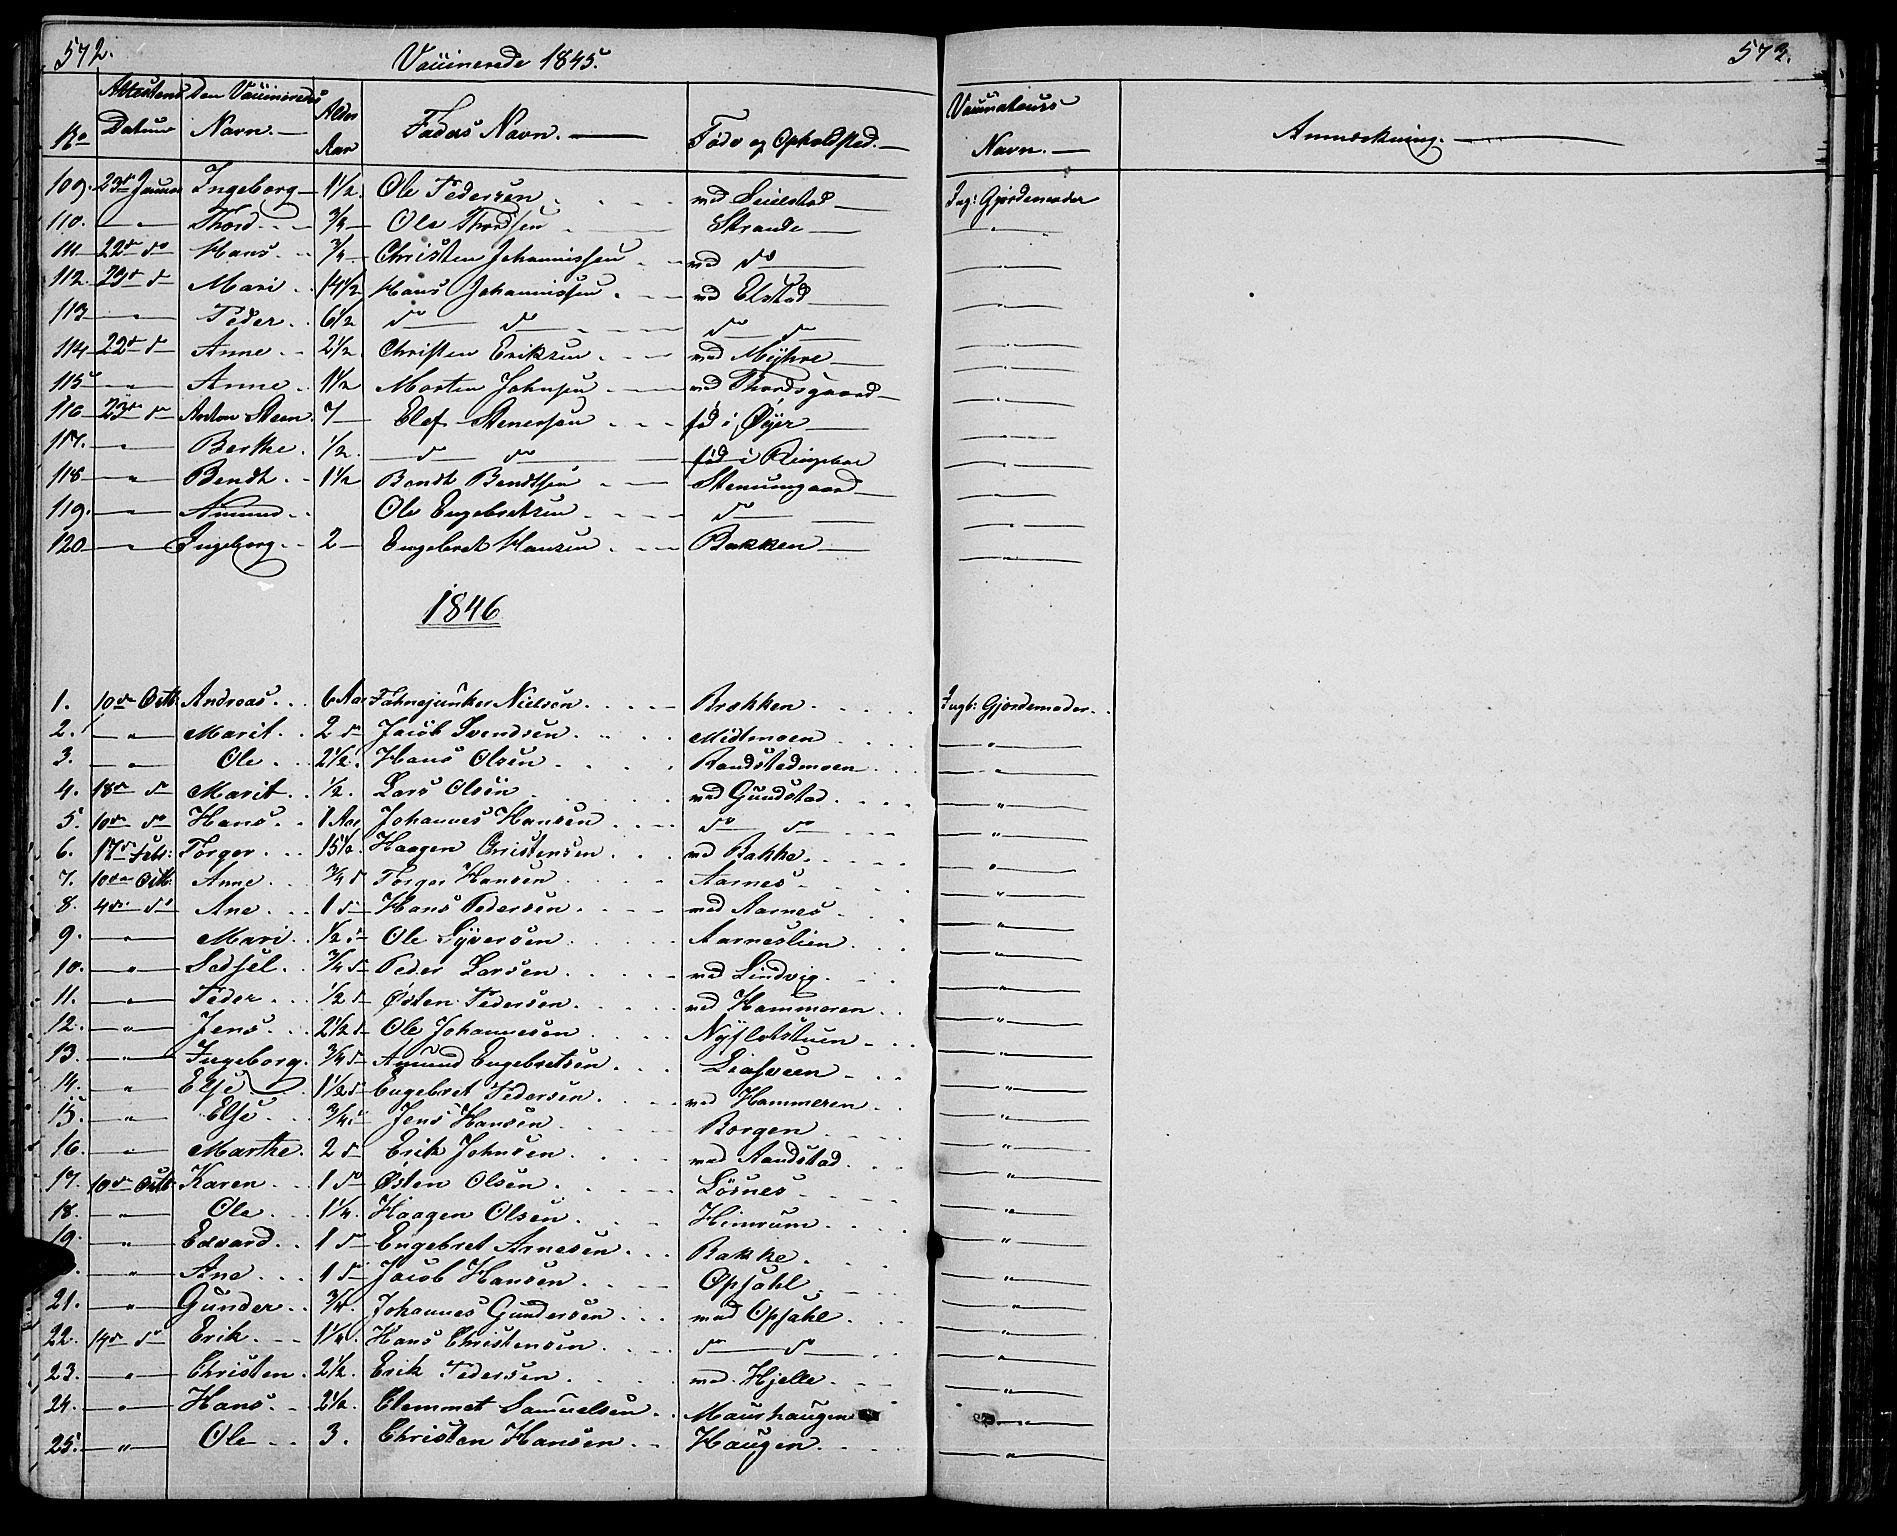 SAH, Ringebu prestekontor, Klokkerbok nr. 2, 1839-1853, s. 572-573